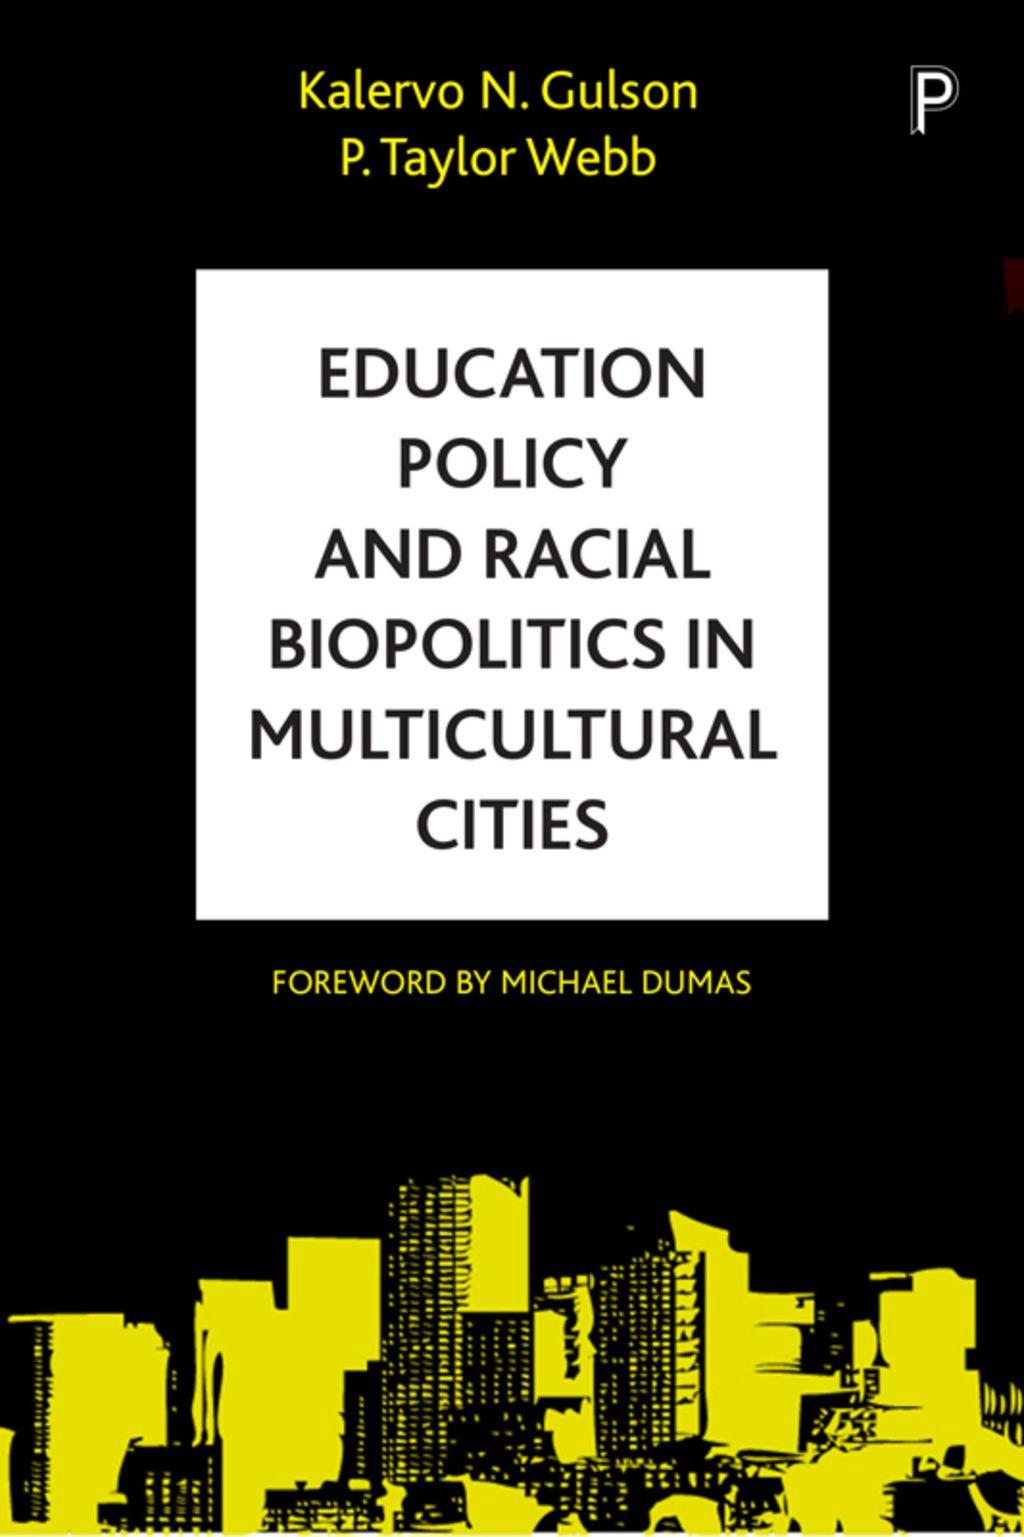 Education Policy and Racial Biopolitics (eBook